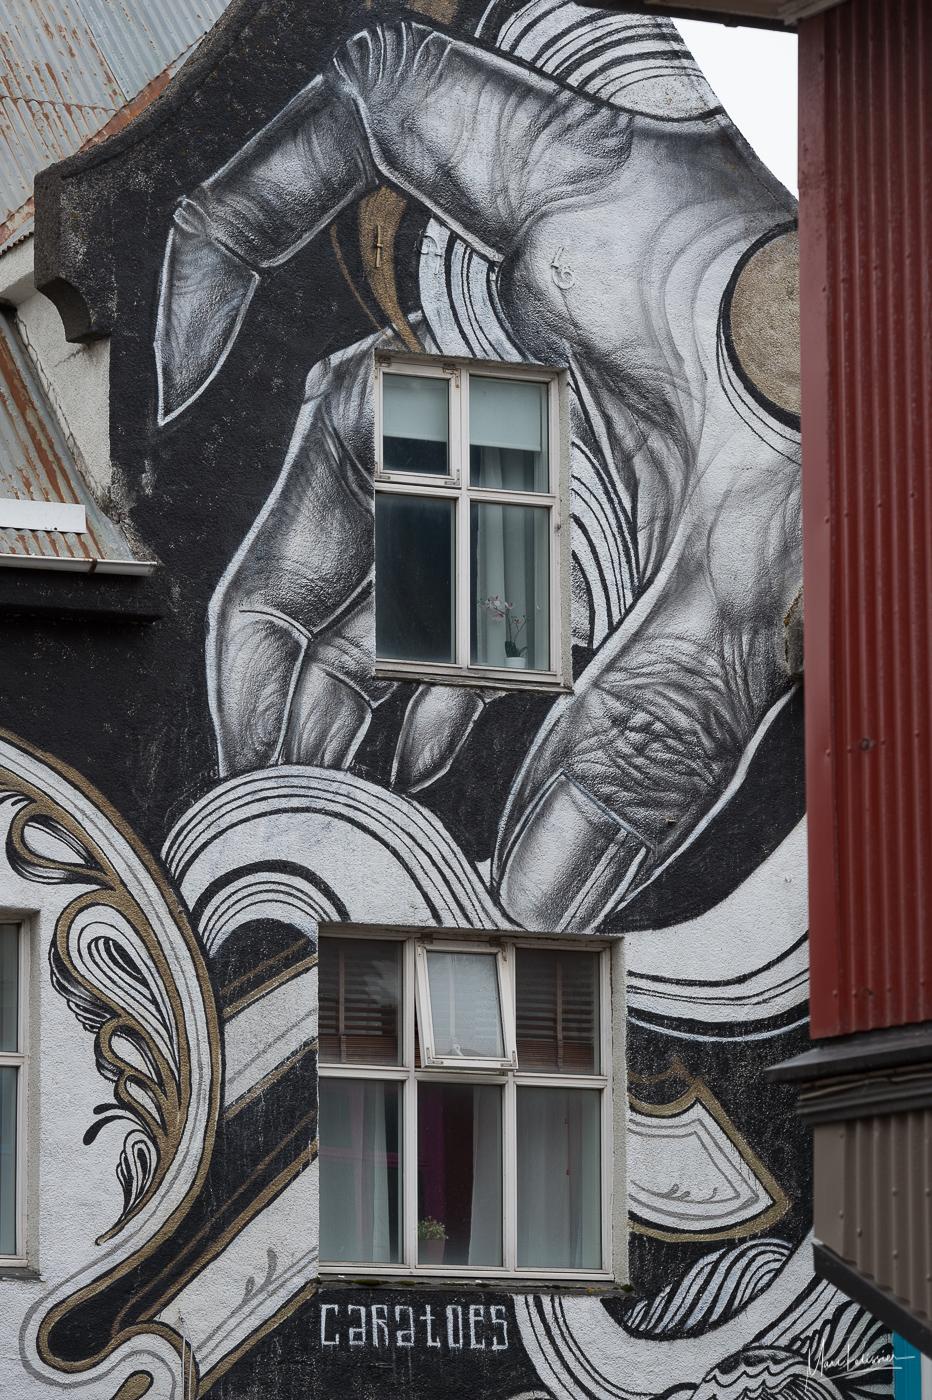 Big hand painting on main street, Iceland